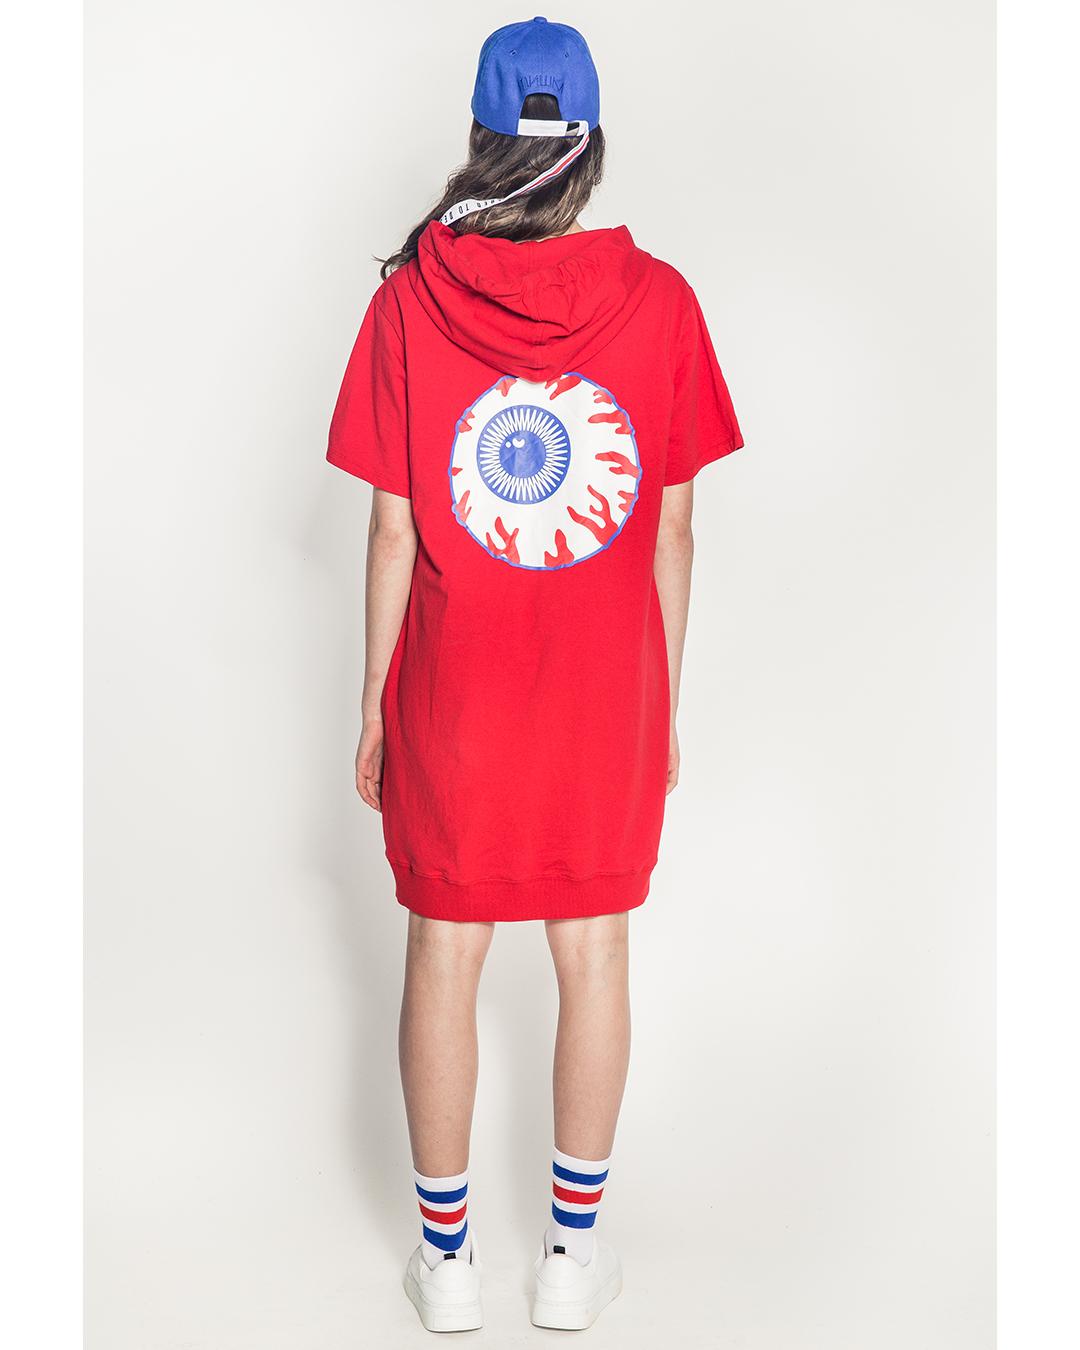 Cyrillic Legacy Girl's Hoody Dress (Red)